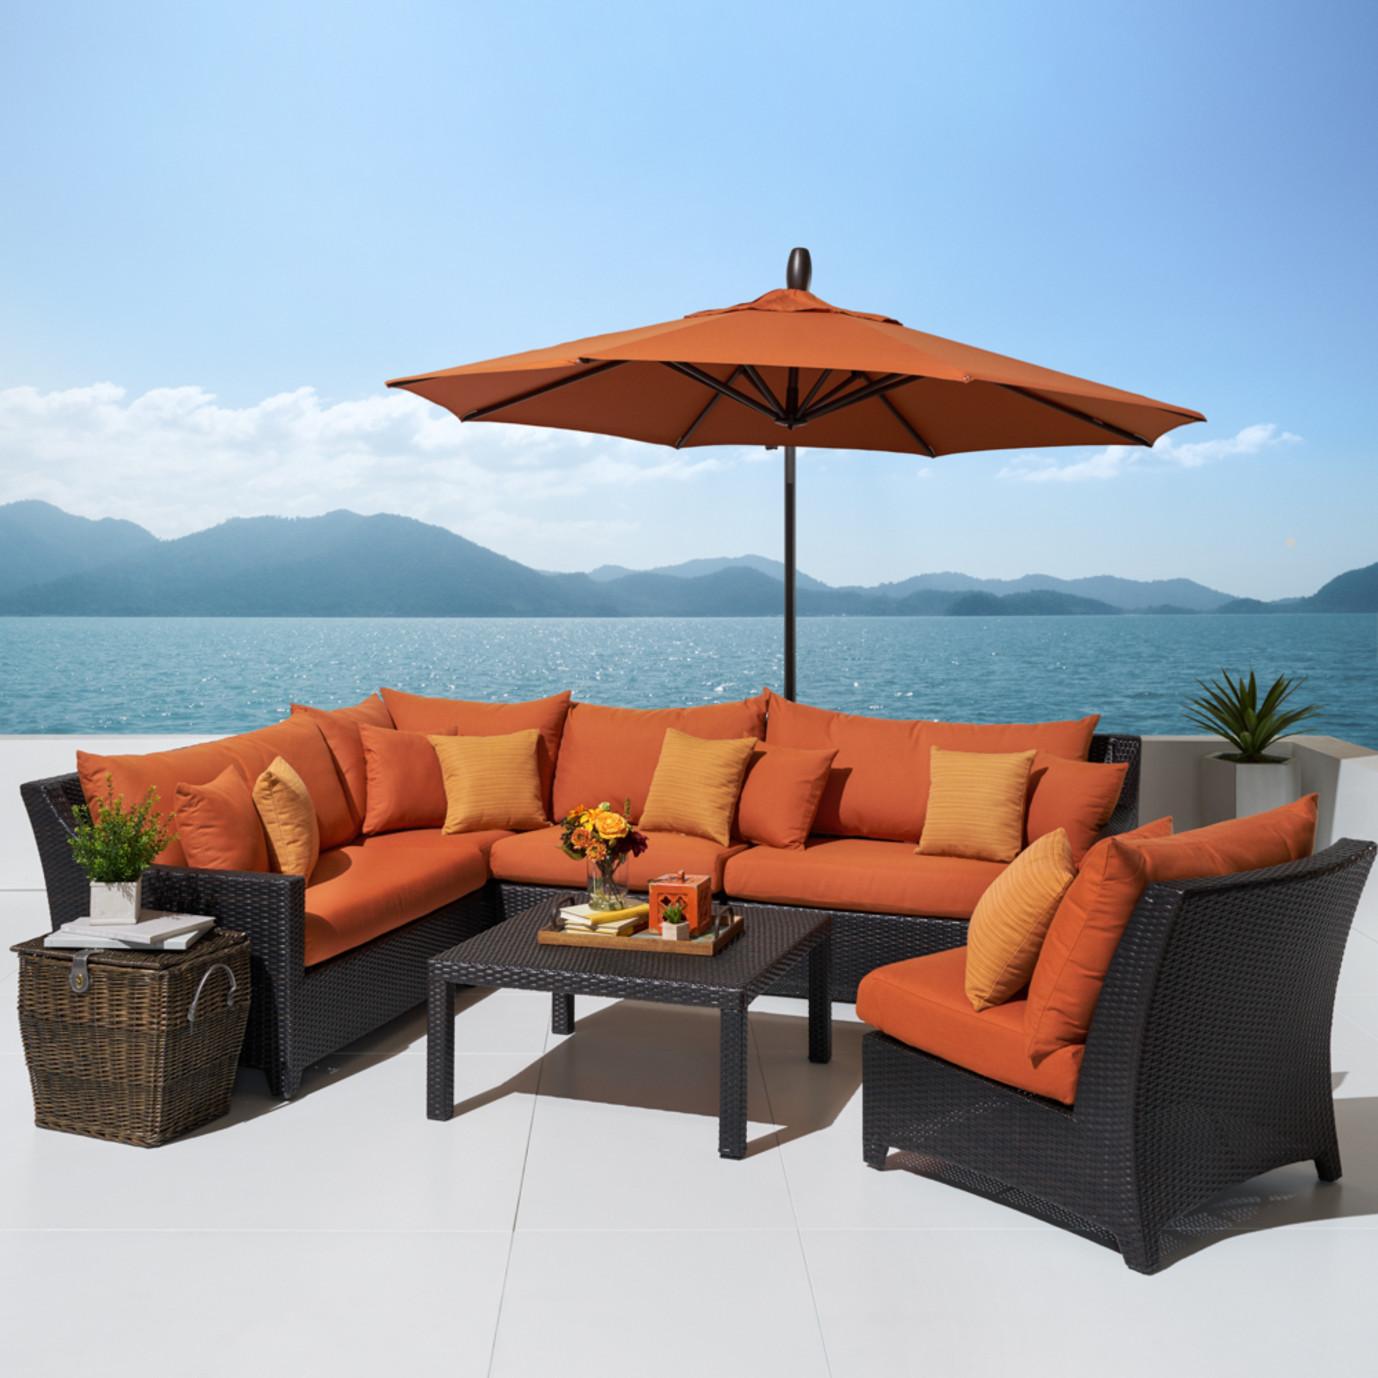 Deco 6pc sectional and table with umbrella tikka orange rst brands - Deco room oranje ...